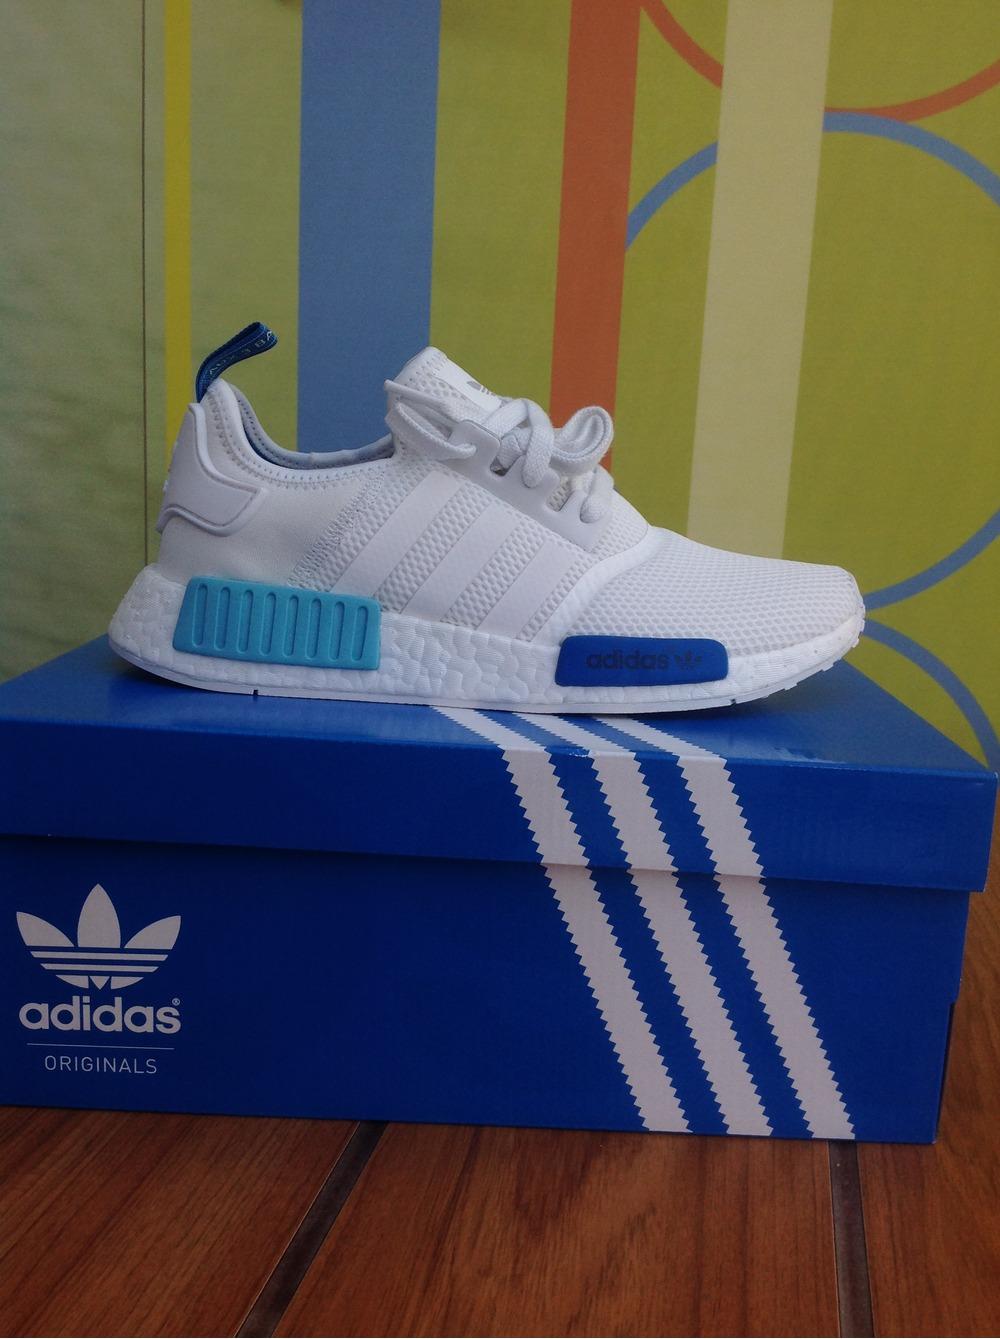 cpqdzt Adidas NMD White Blue ptmgardening.co.uk